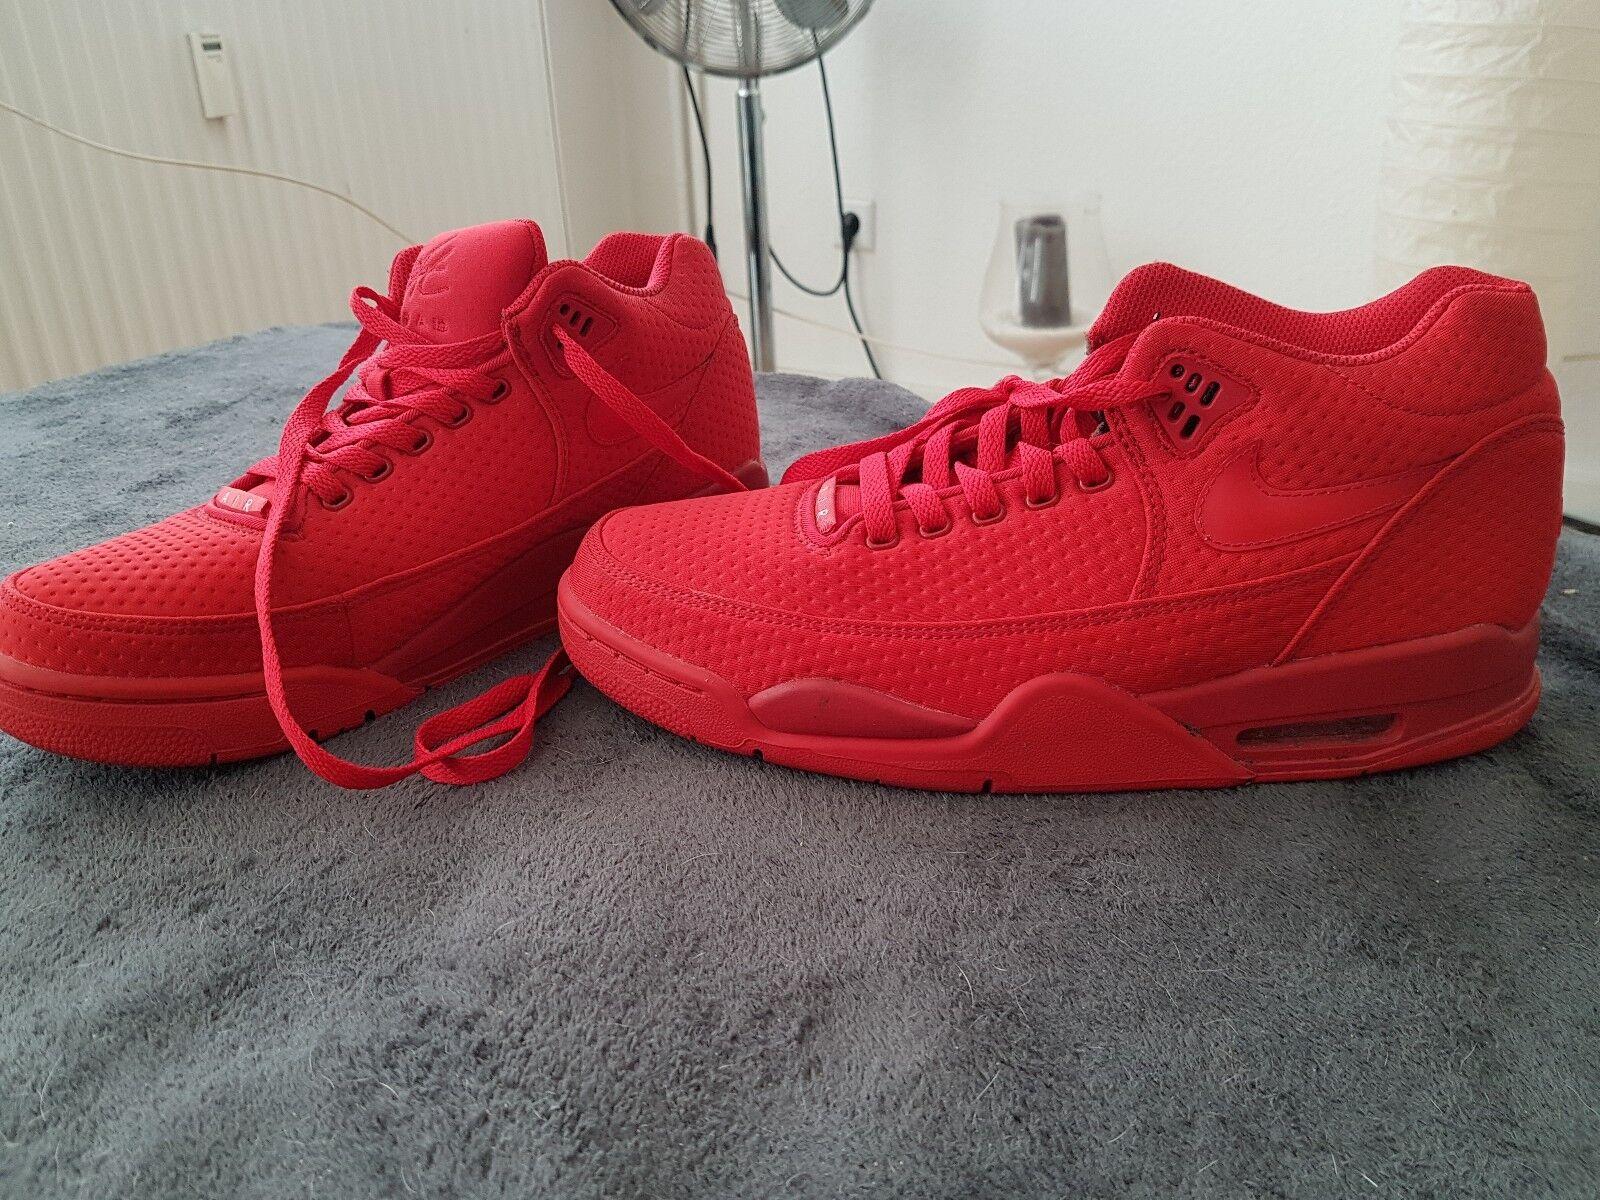 Billig gute Qualität Nike Schuhe Rot 42.5